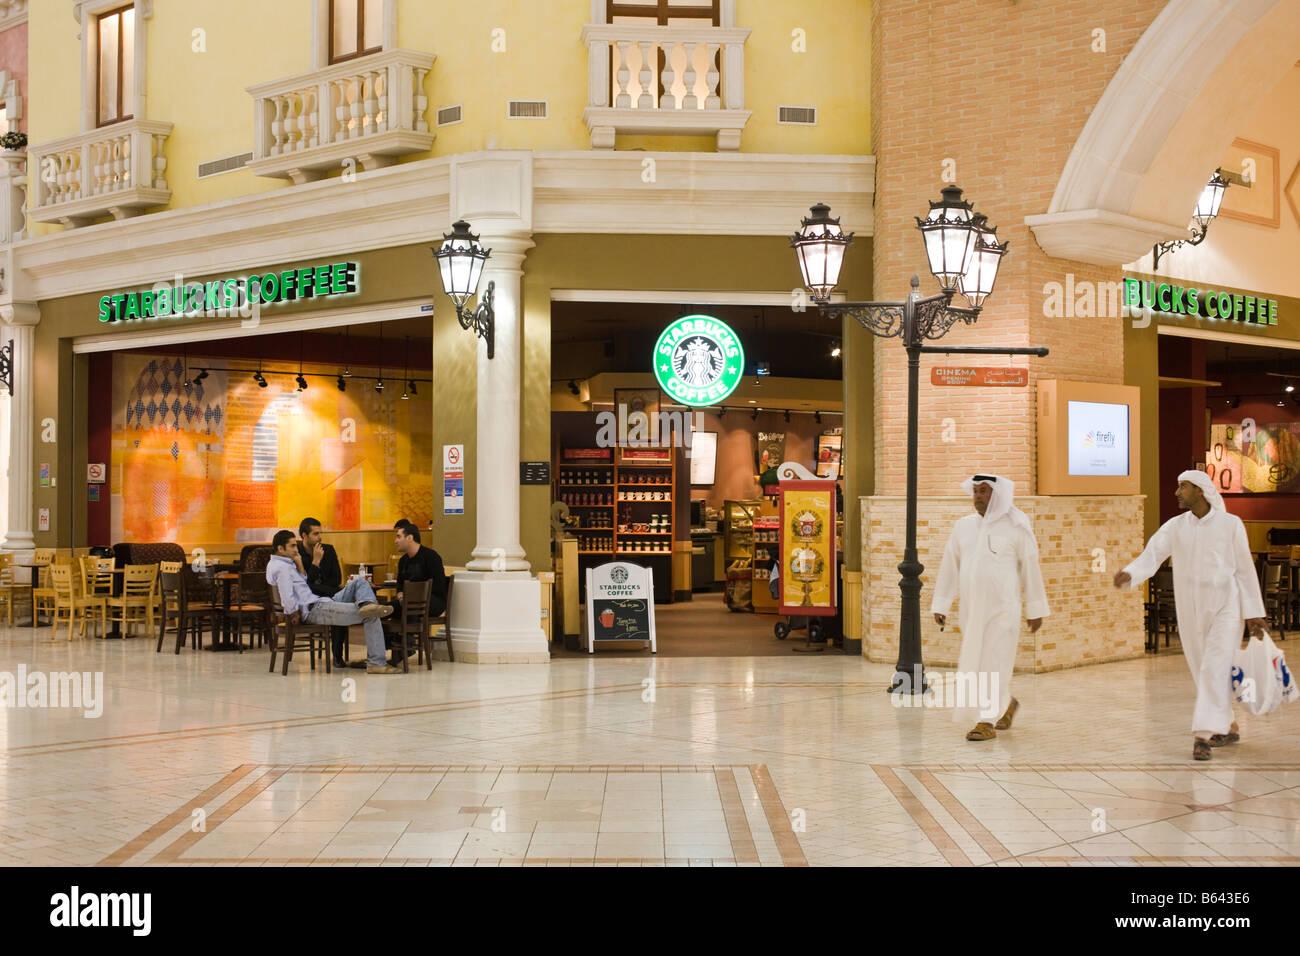 Starbucks, Villagio Mall, Doha, Qatar Photo Stock